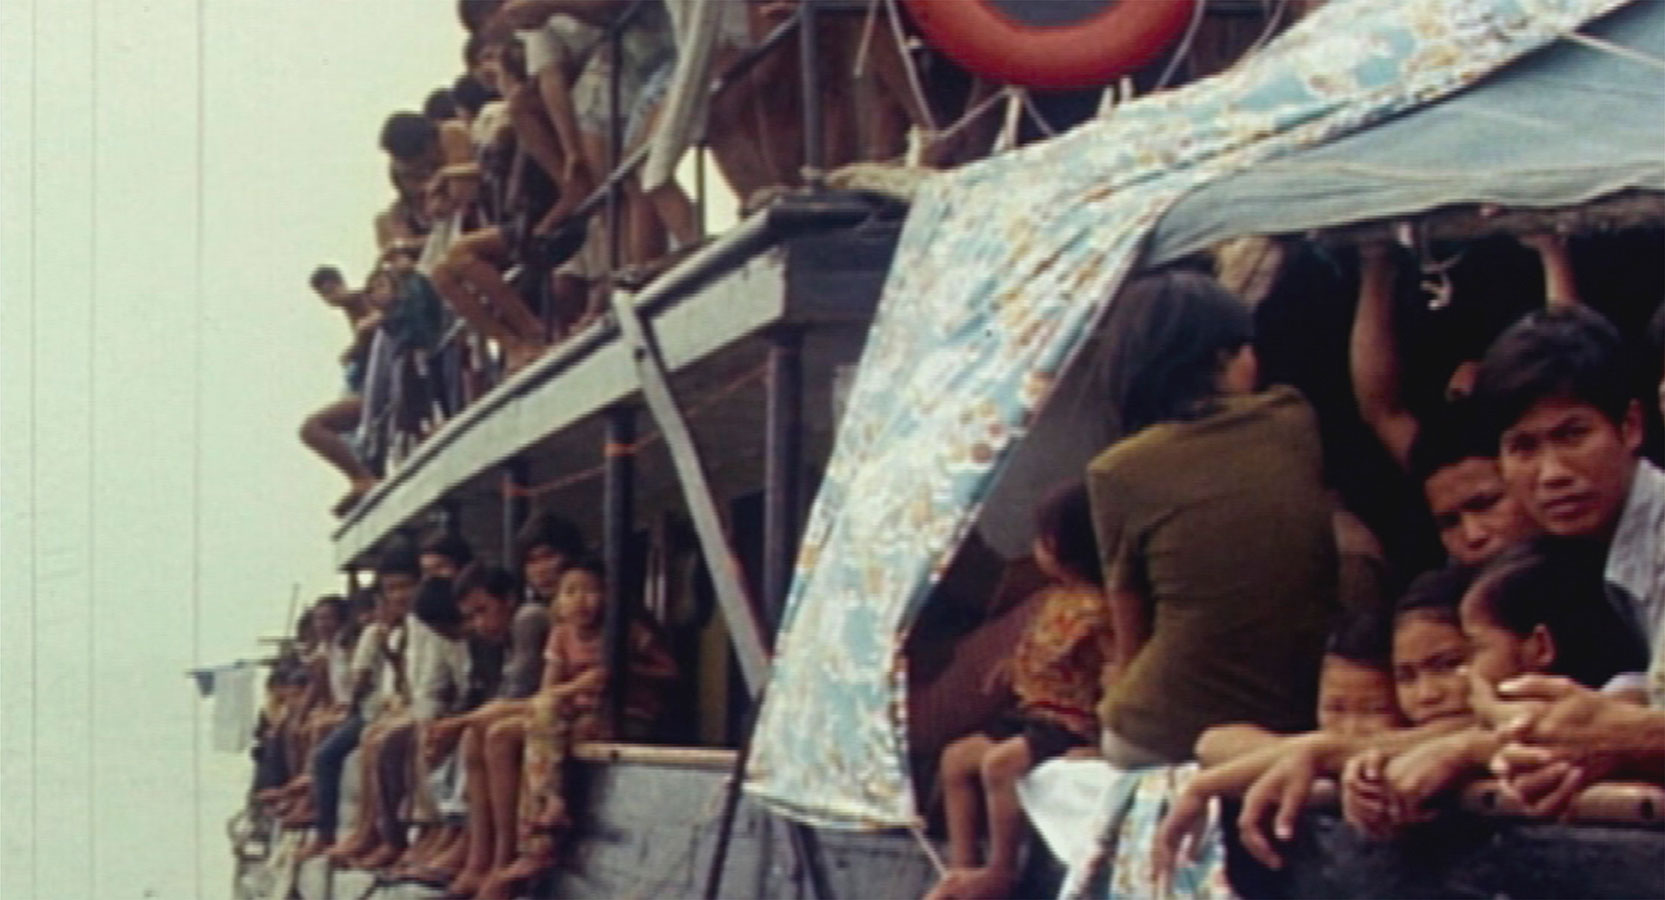 Chasing Asylum Dogwoof documentary still 22.jpg